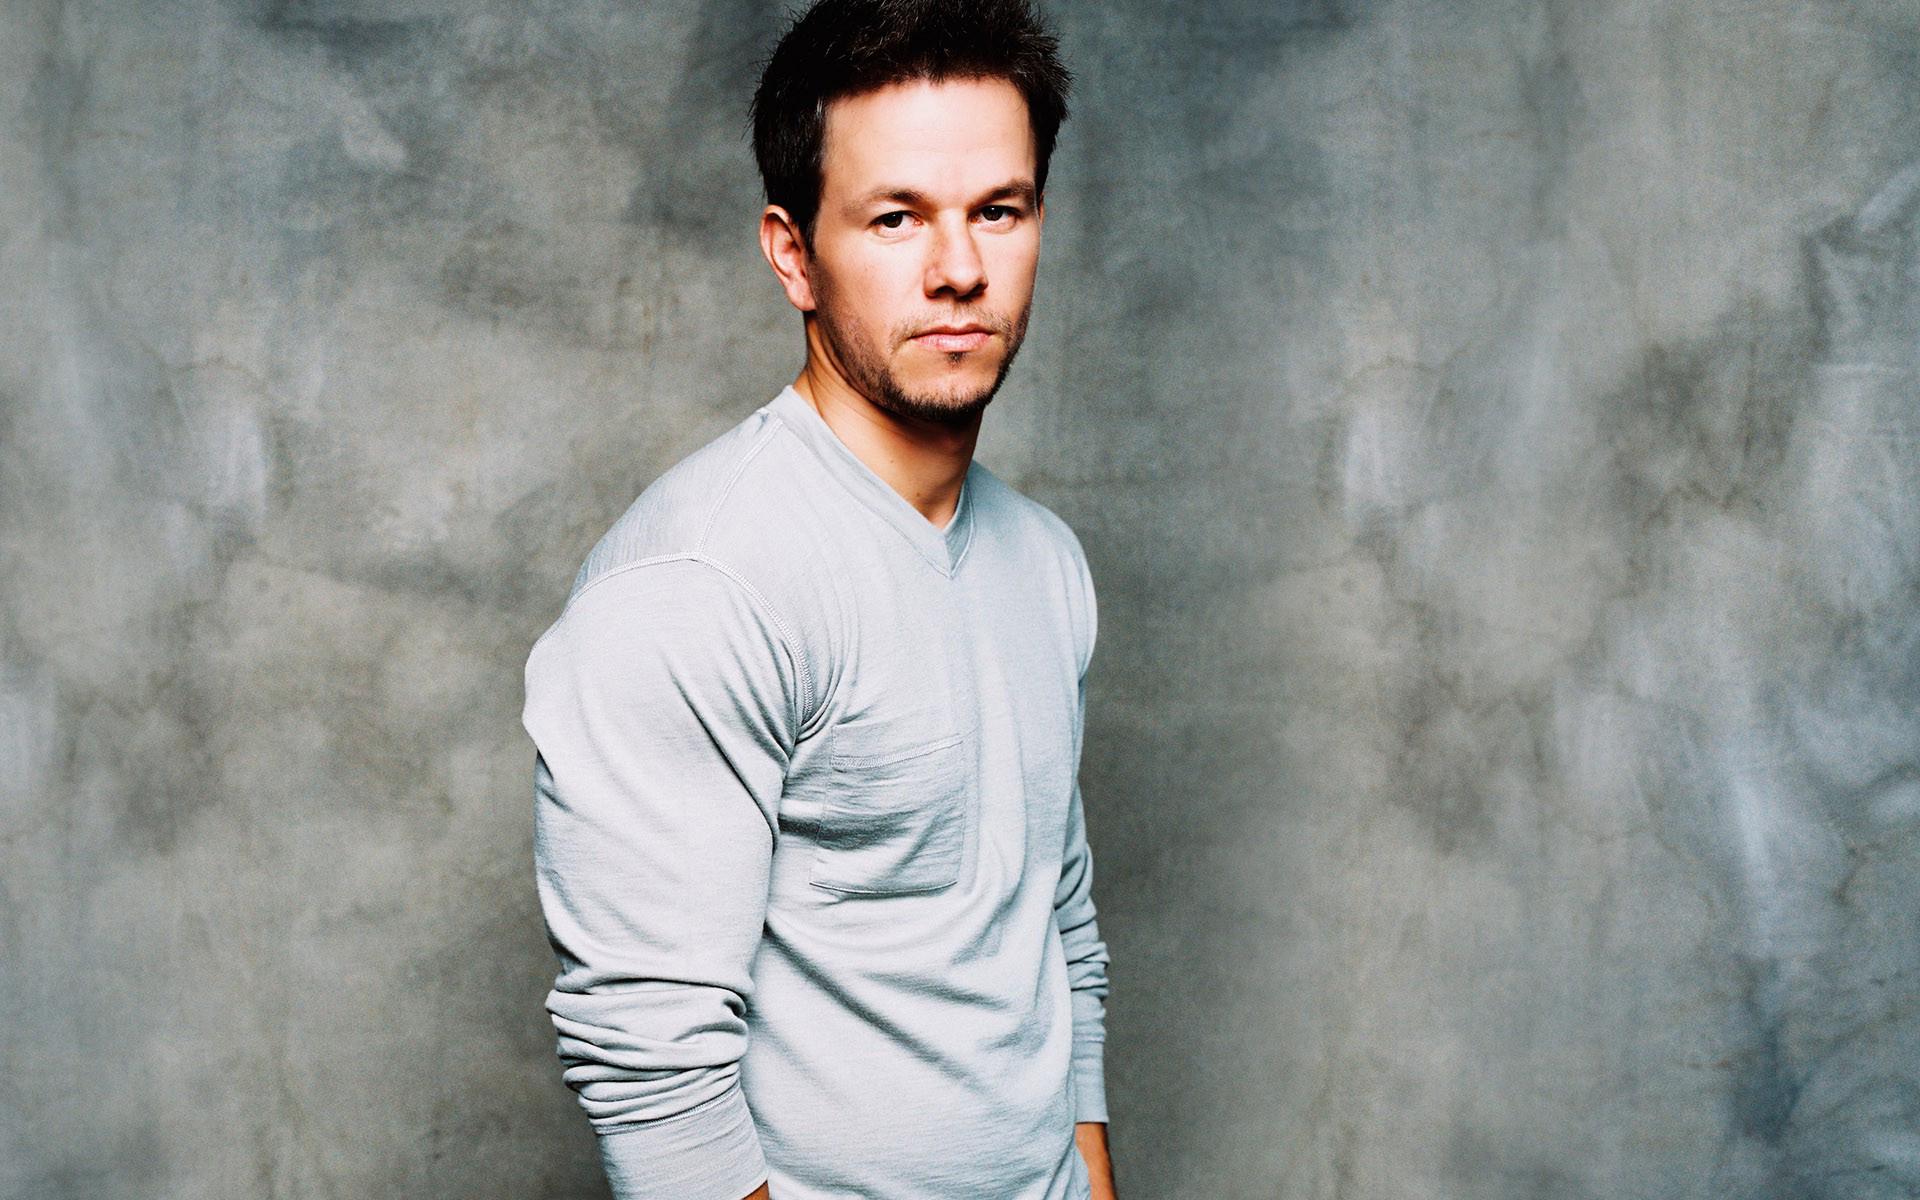 Mark Wahlberg wallpaper 1920x1200 77213 1920x1200